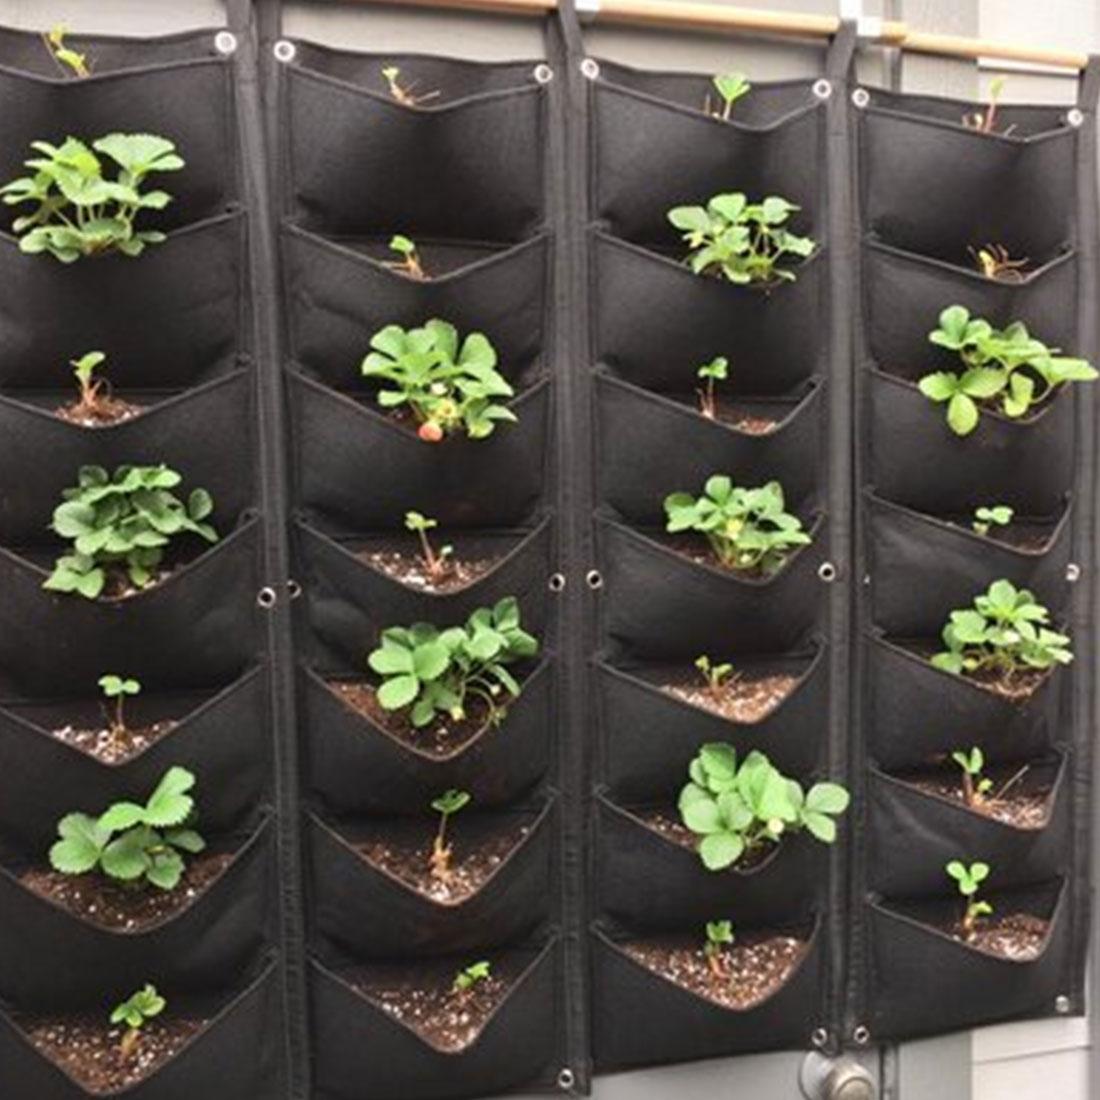 Grow Bag Vegetable Plant Wall Hanging Vertical Gardening Pockets Black Felt Fabric Pots Garden Supplies